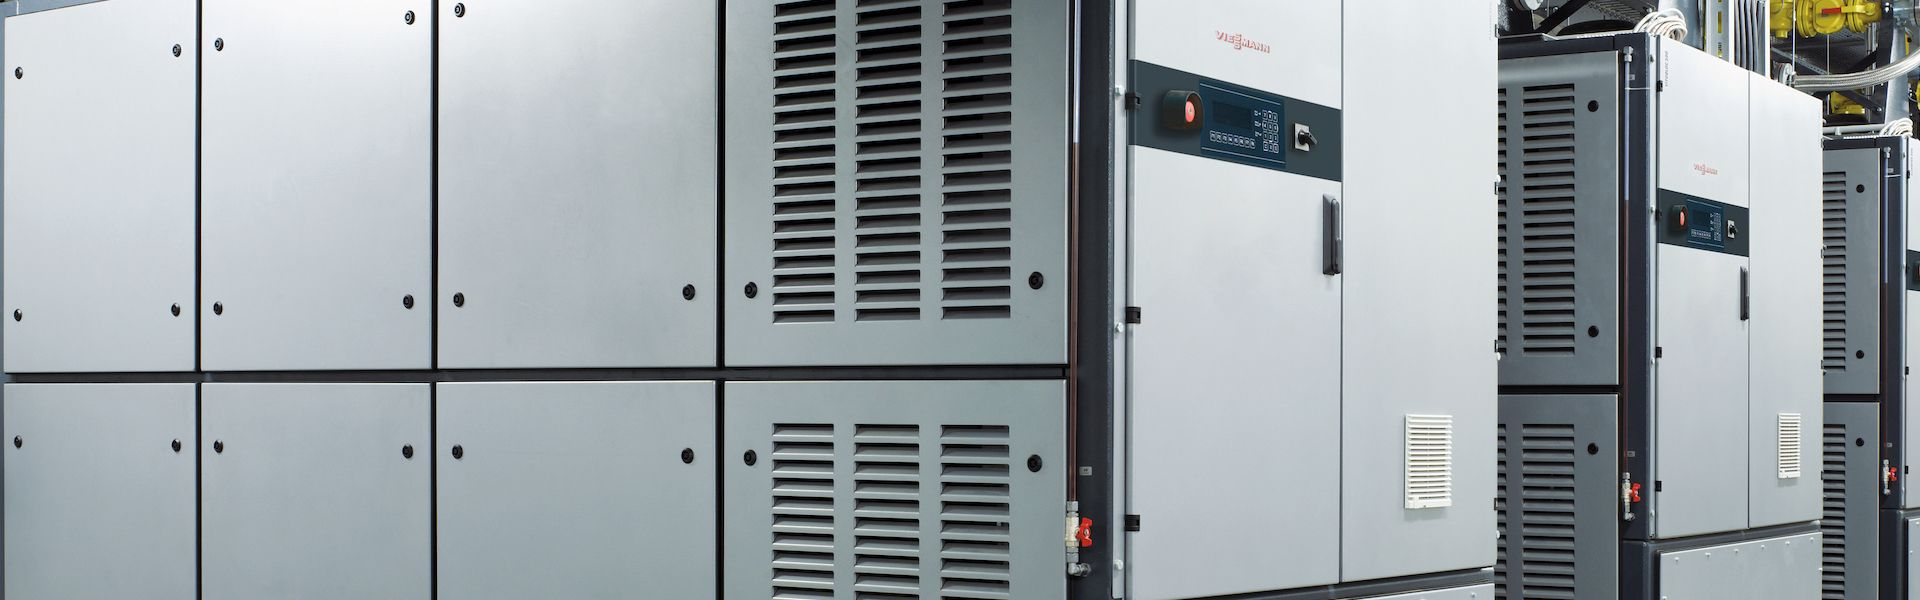 impianti-cogenerazione-compressor